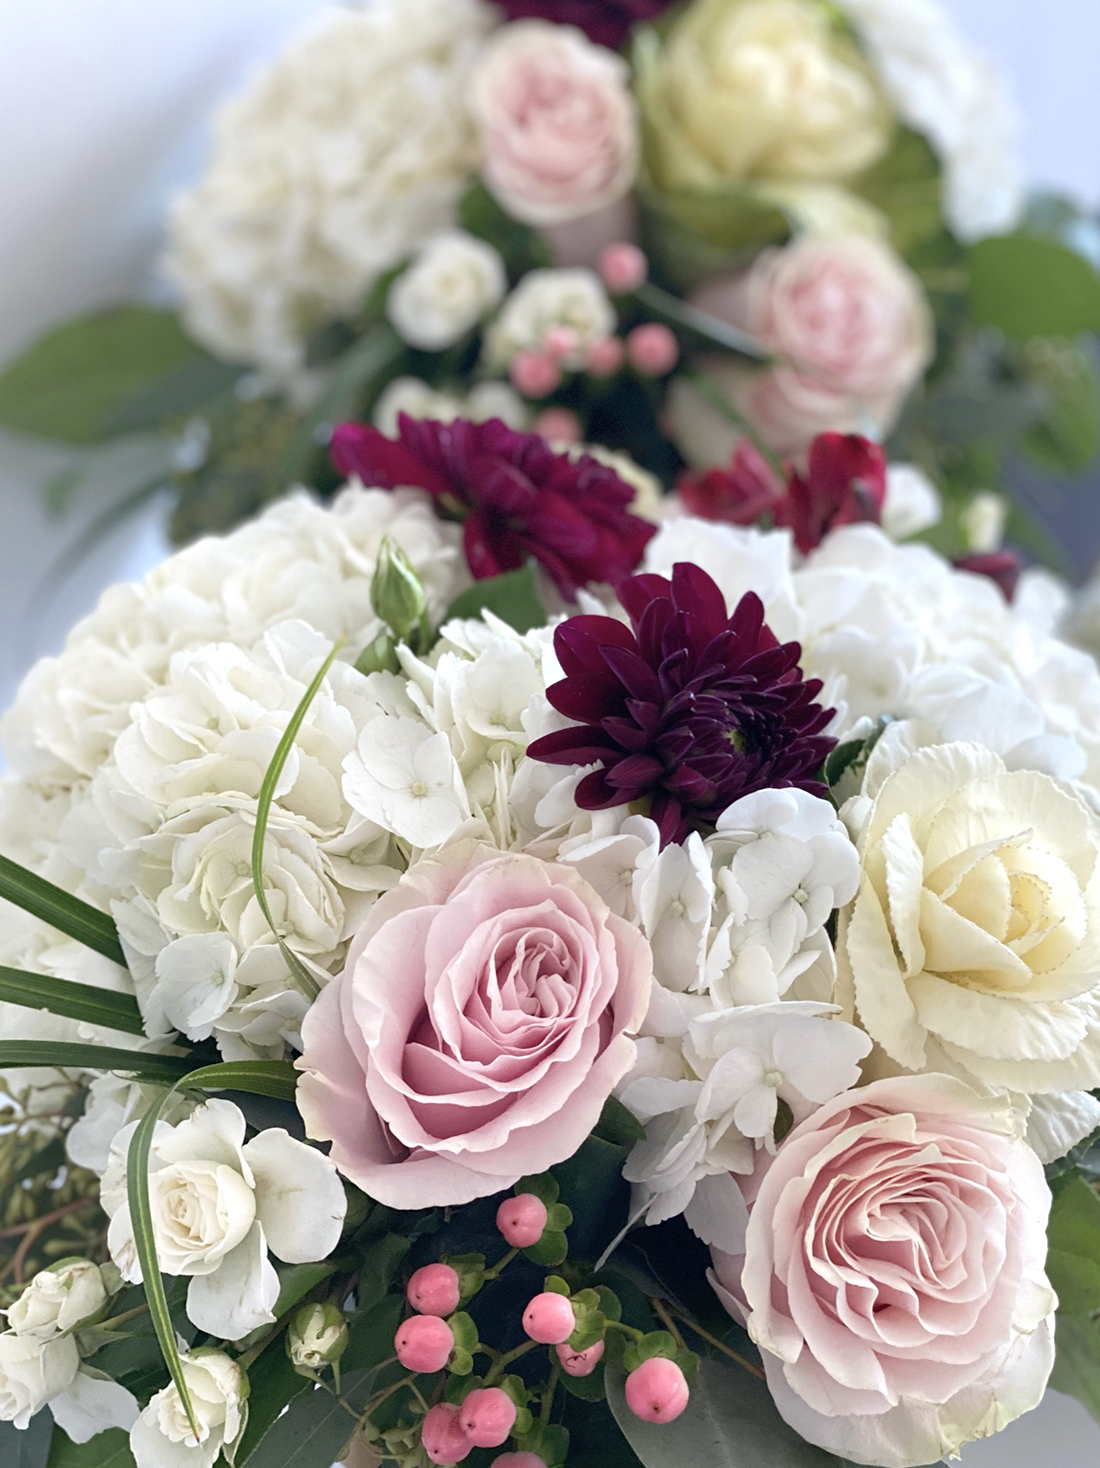 Pandemic Wedding florist in Frisco, DFW, Texas